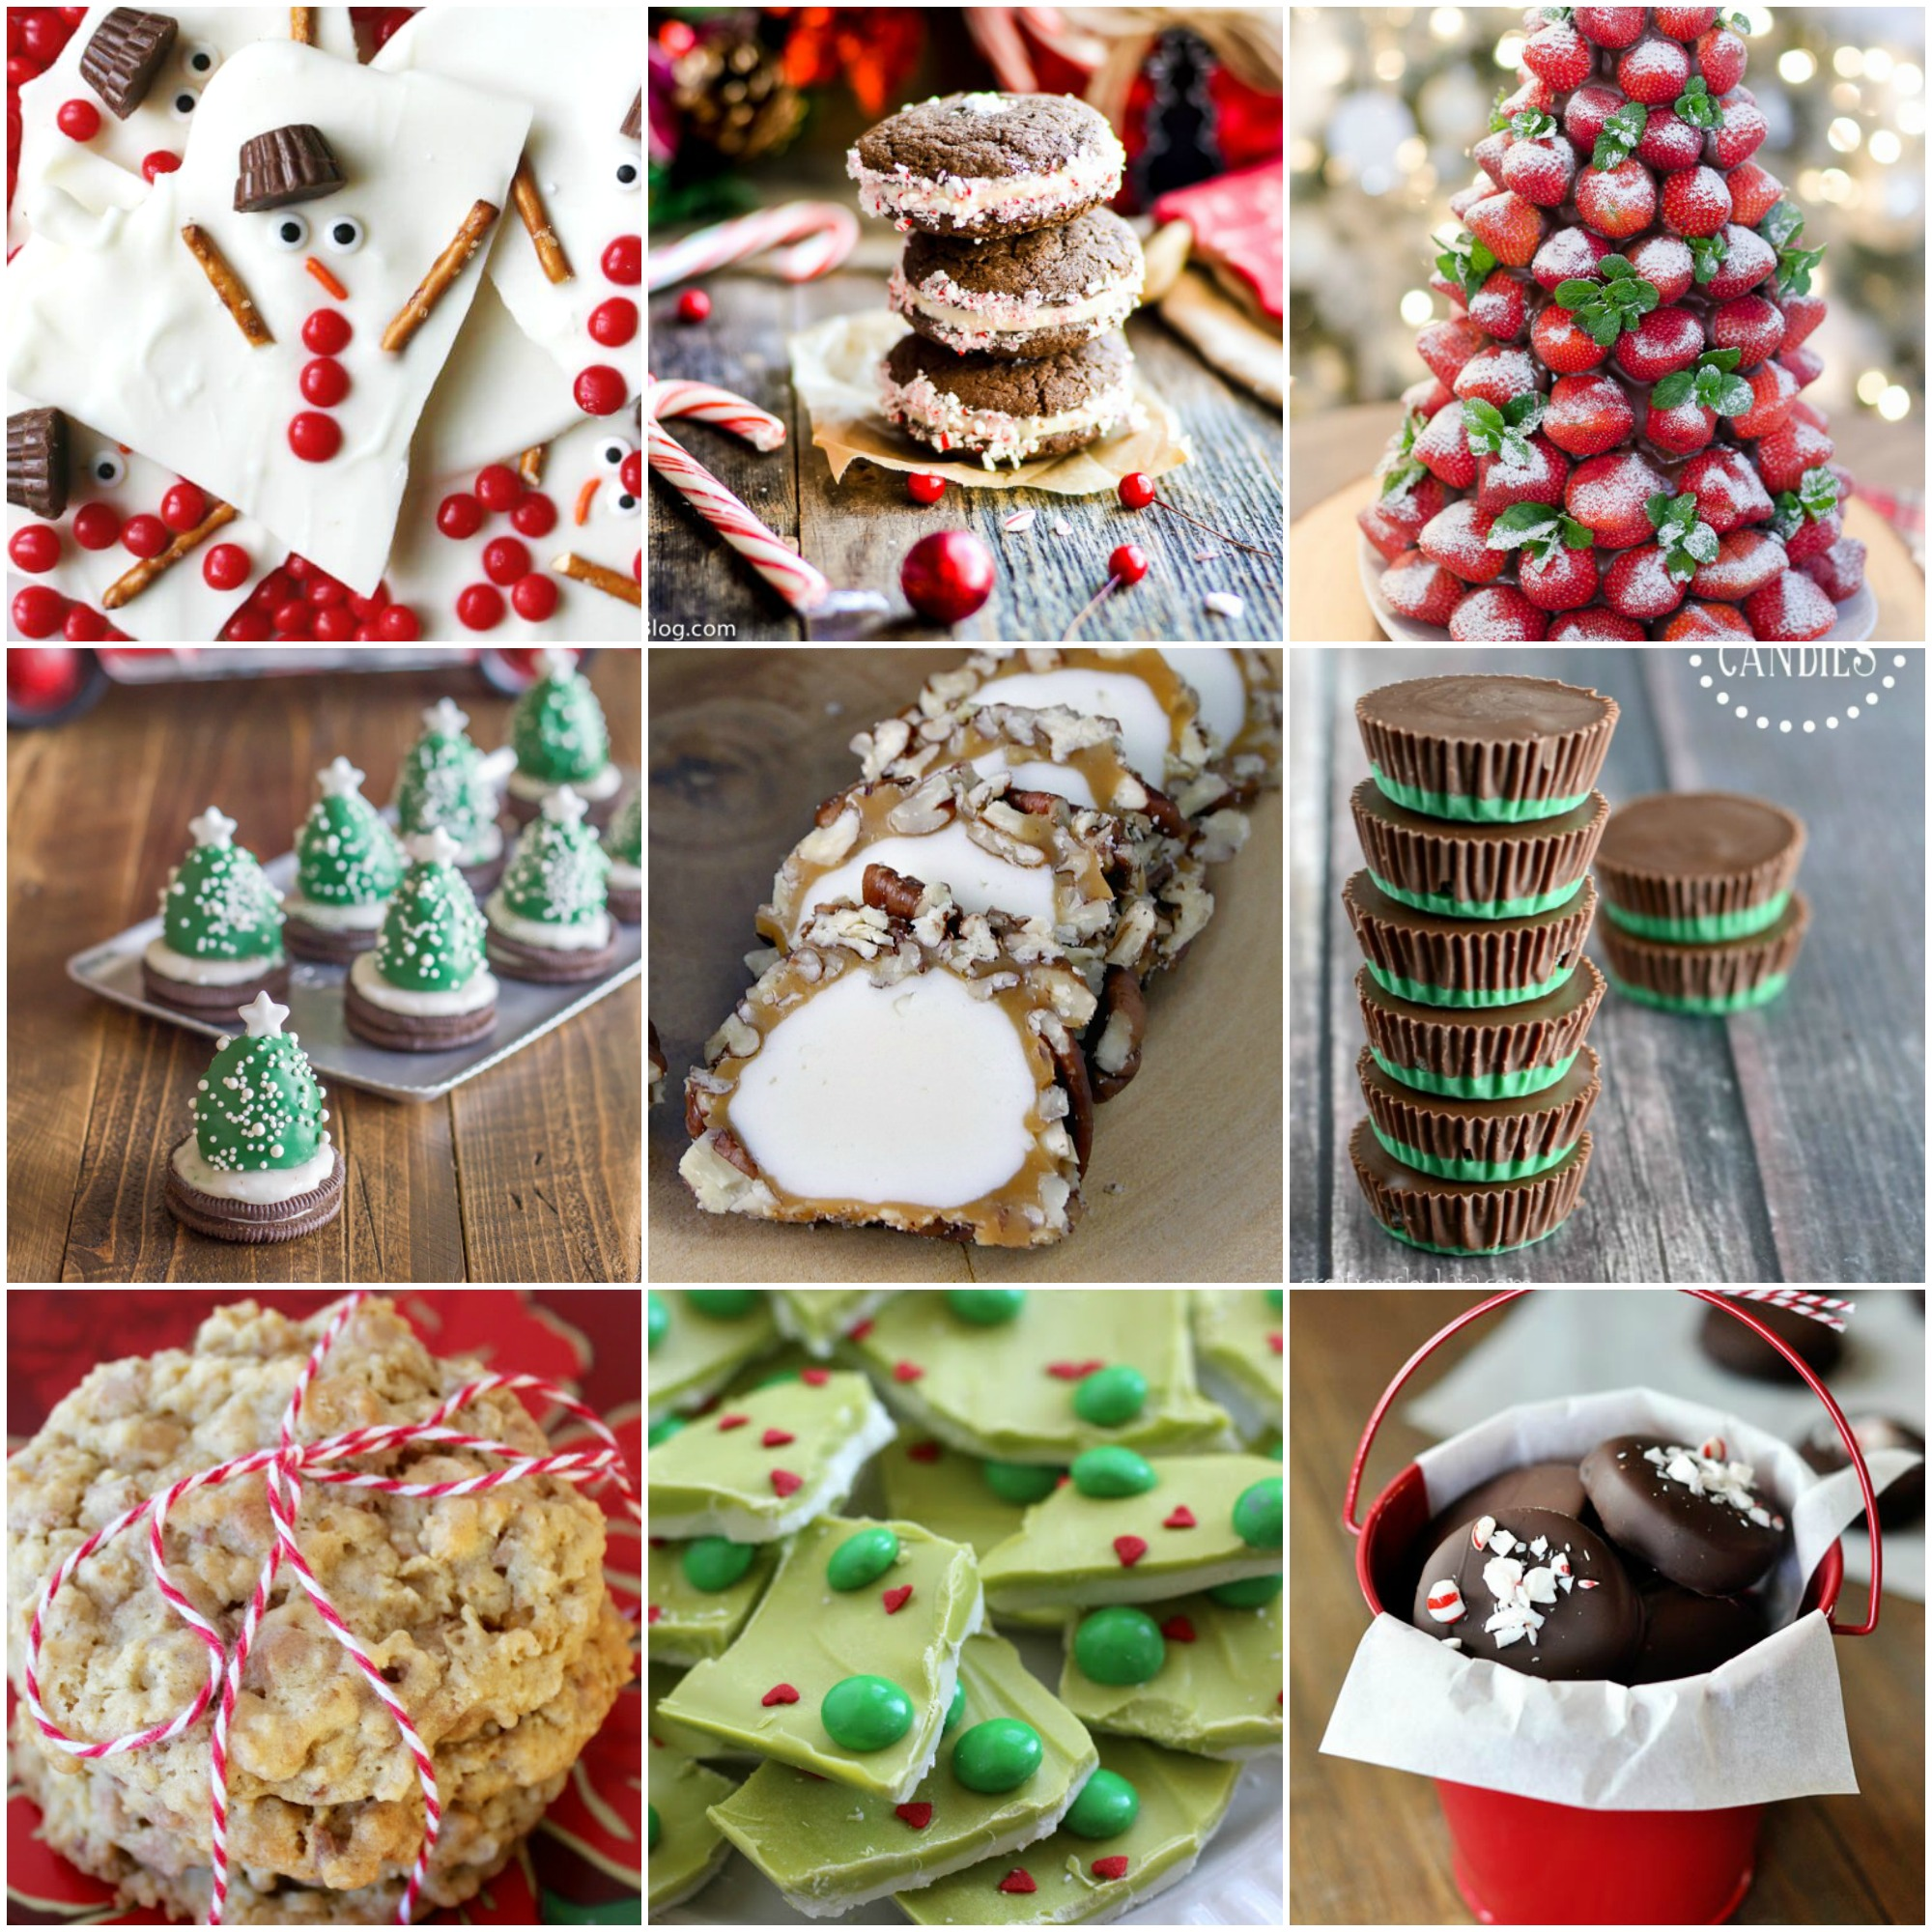 25 Christmas Desserts